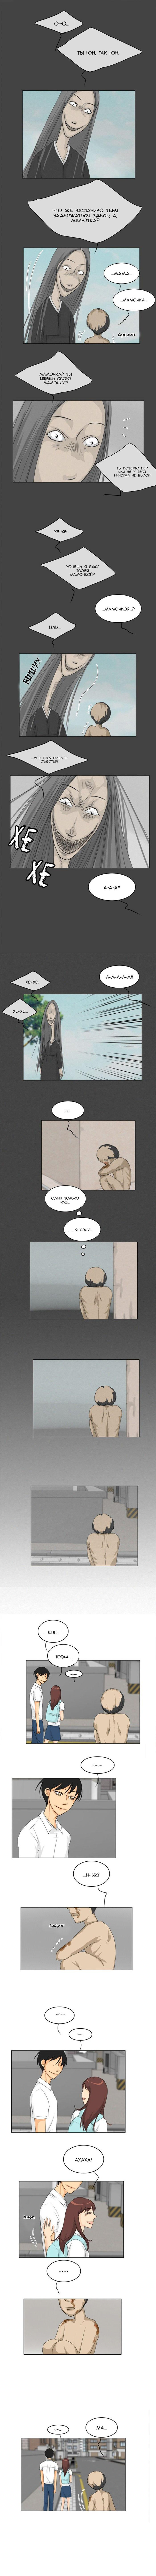 https://r2.ninemanga.com/comics/pic5/8/31048/1409659/156197575163.jpg Page 3